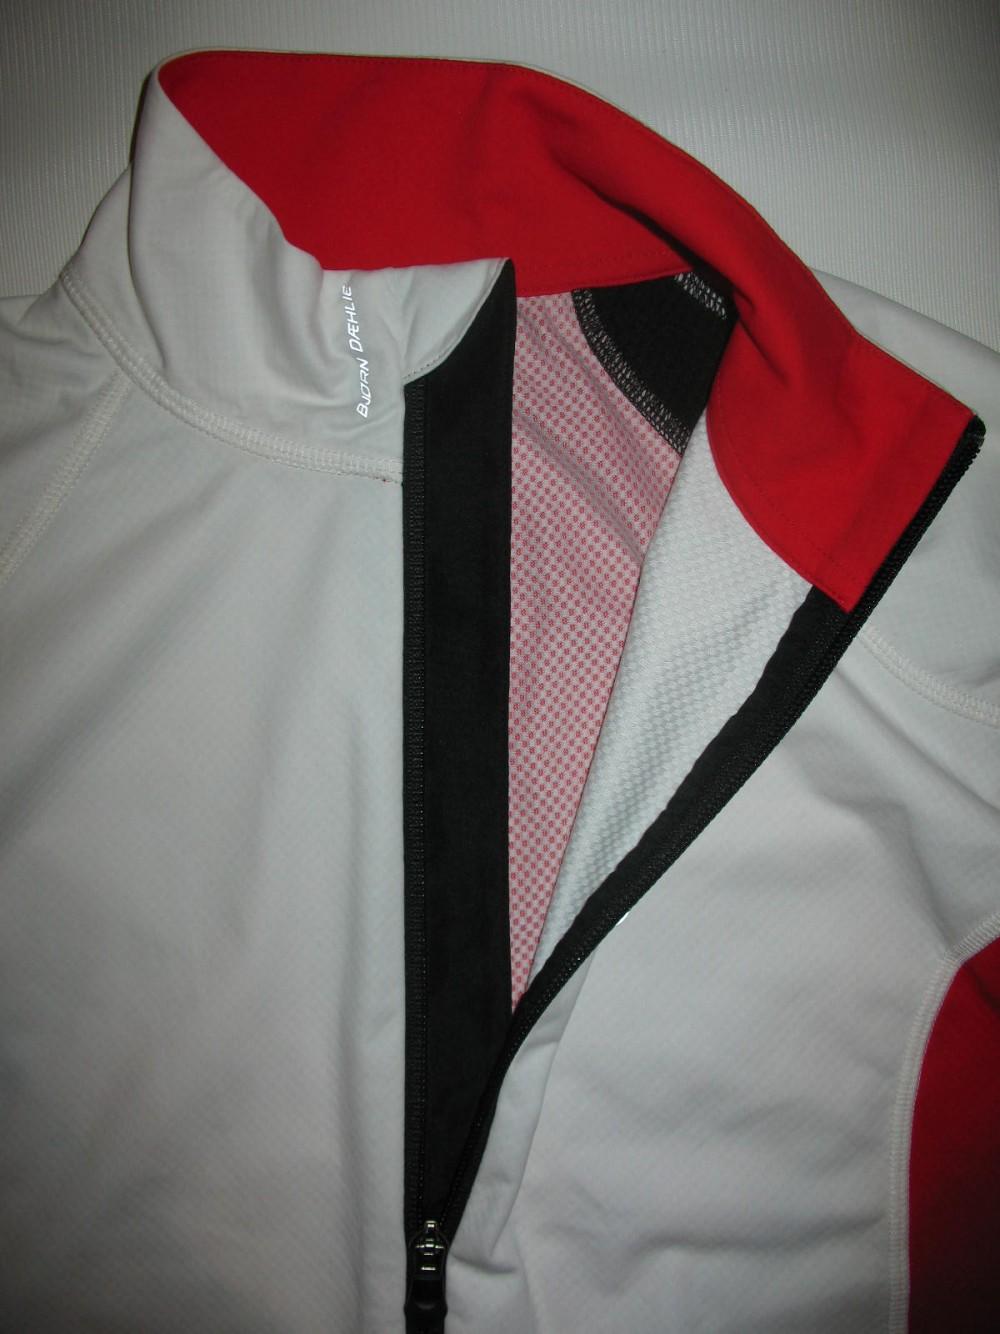 Куртка BJORN DAEHLIE softshell light jacket lady (размер L) - 5